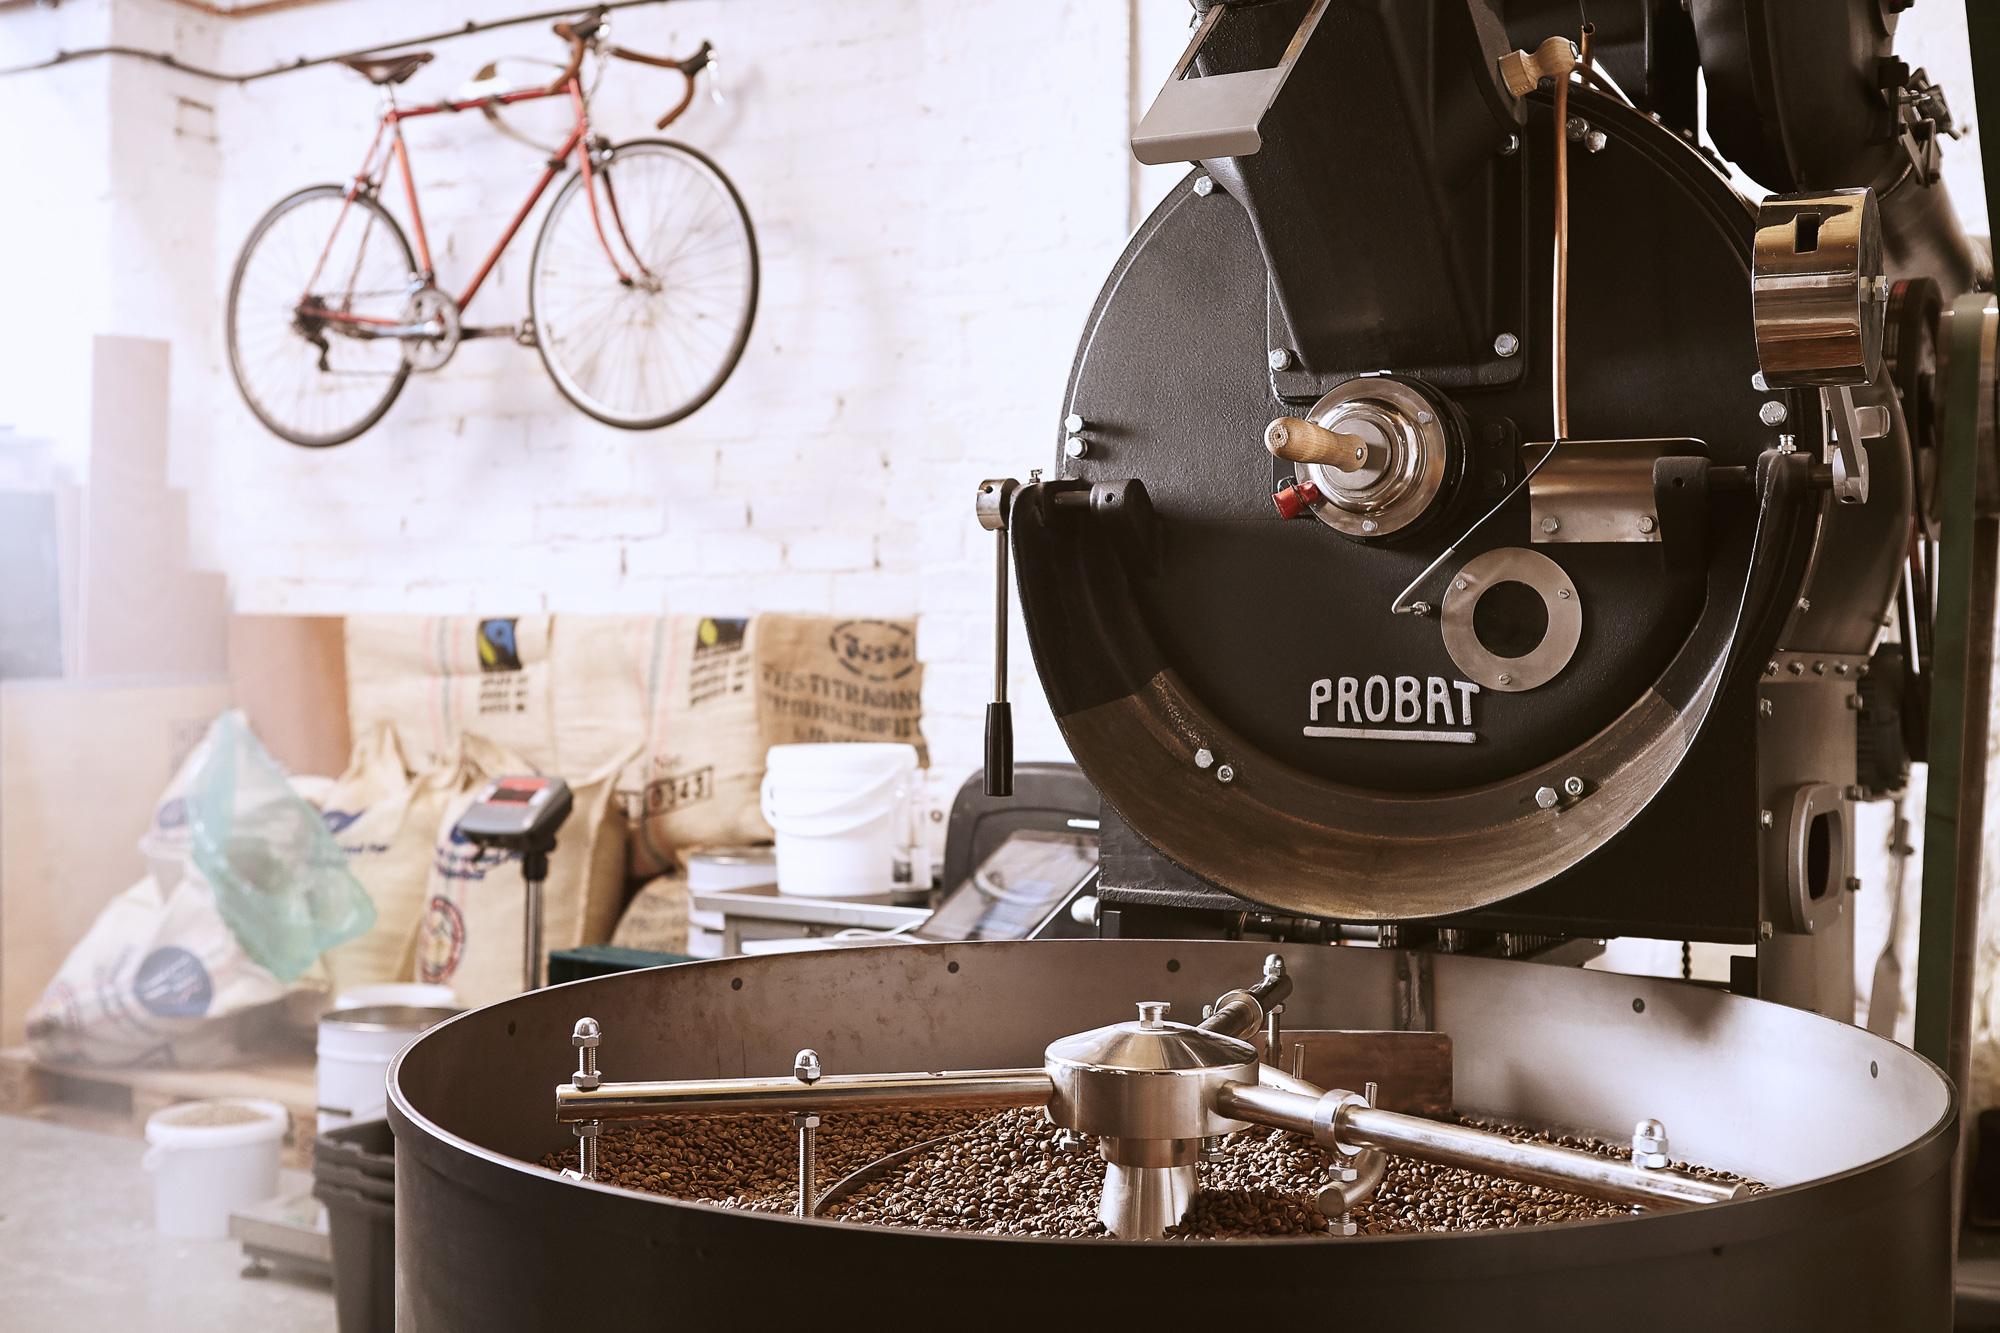 ProbatUG15coffeeroastercartel.jpg